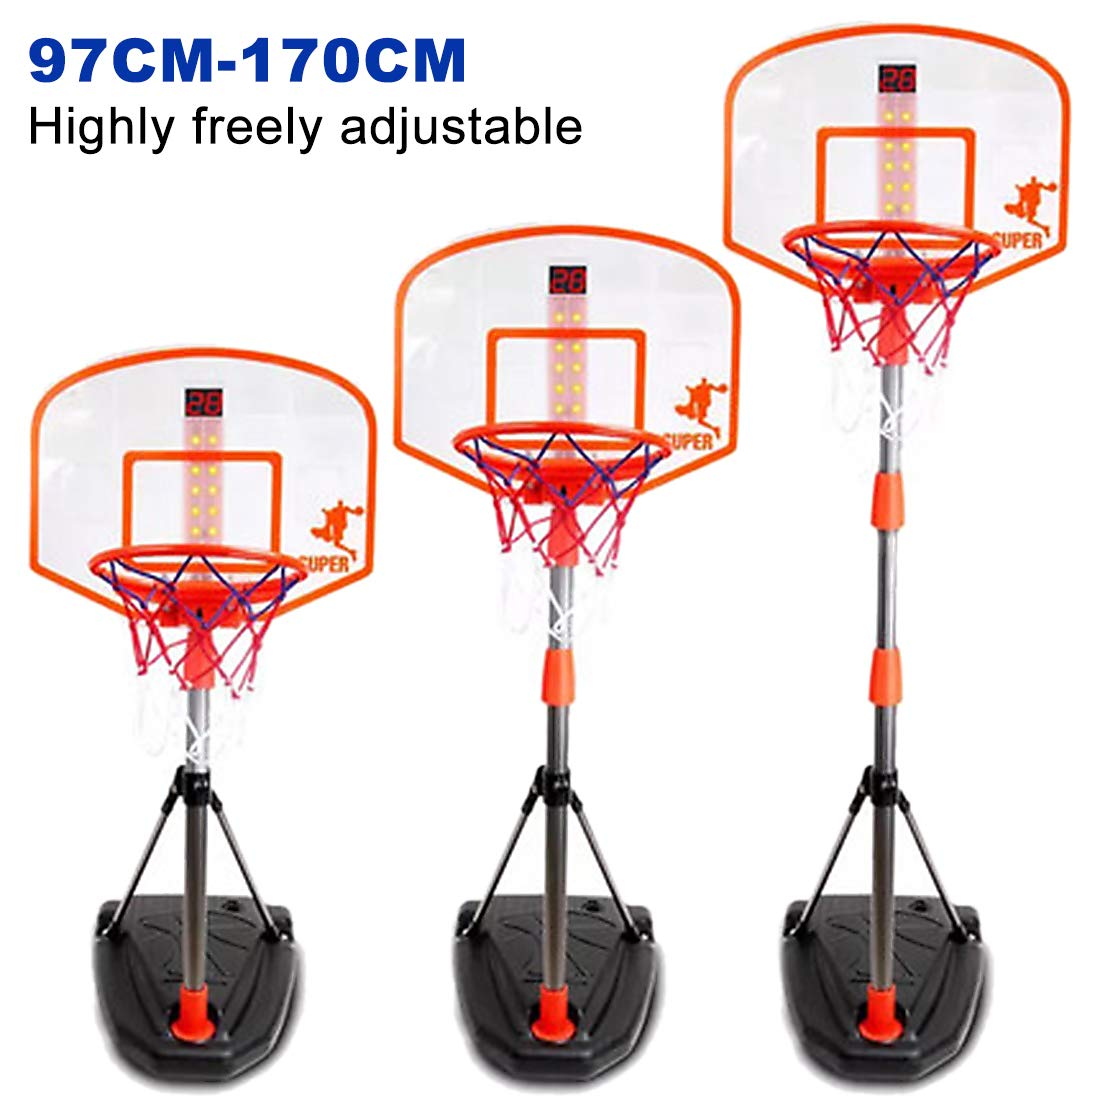 Mecotech Canasta Baloncesto Infantil, 97-170CM Ajustable Canasta Baloncesto con Dispositivo de puntuación para Exterior y Interior